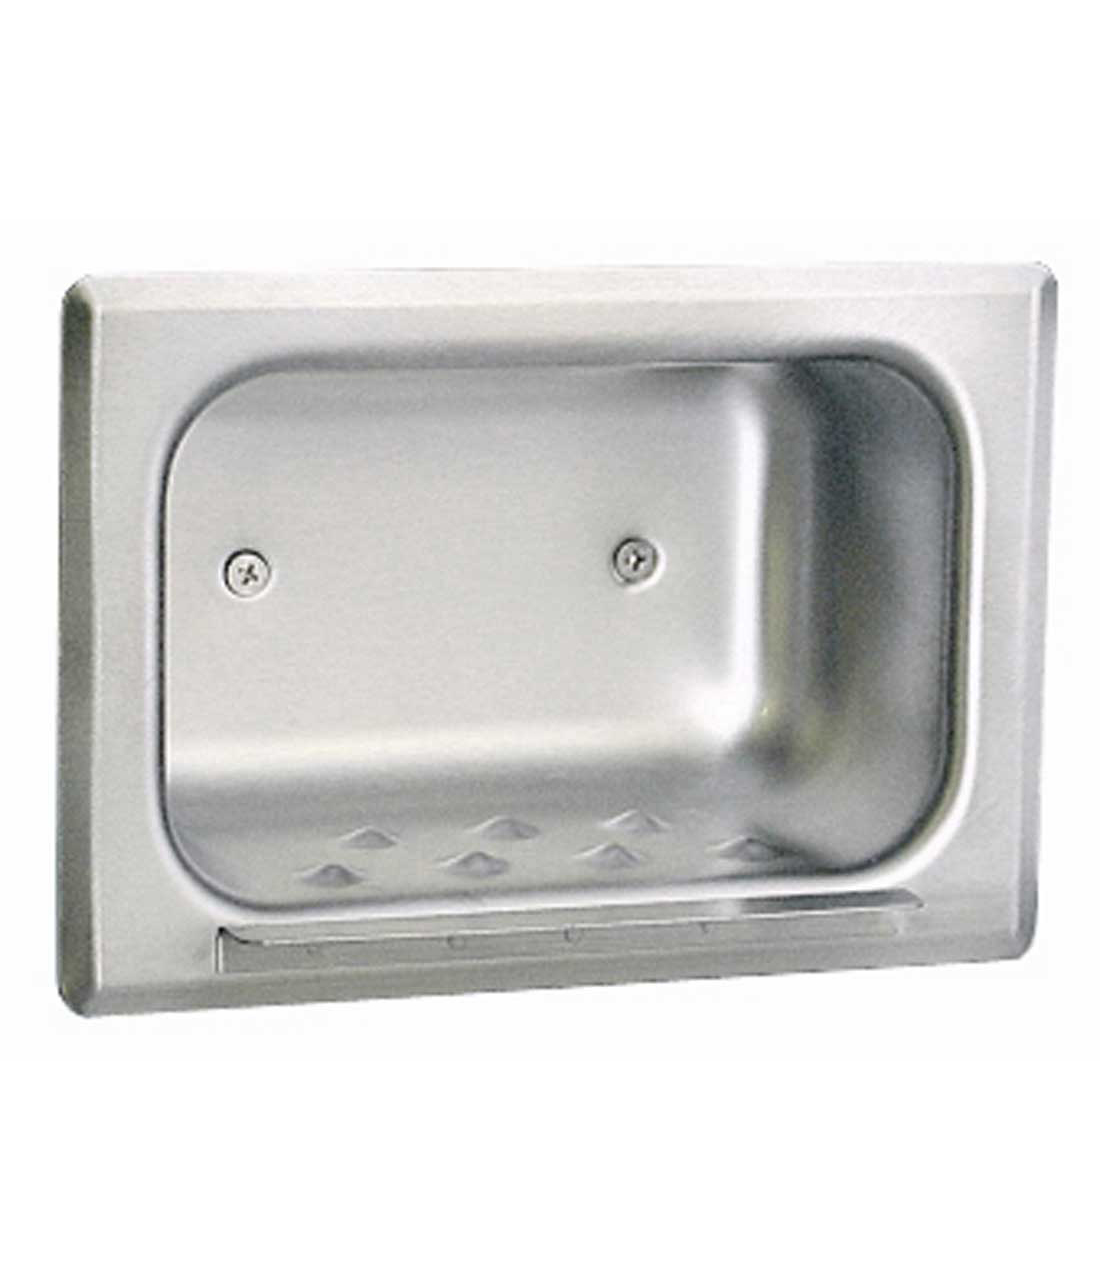 Bobrick Recessed Heavy Duty Soap Dish Part Number B 4380 Shower Tub Accessories Washroom Inc